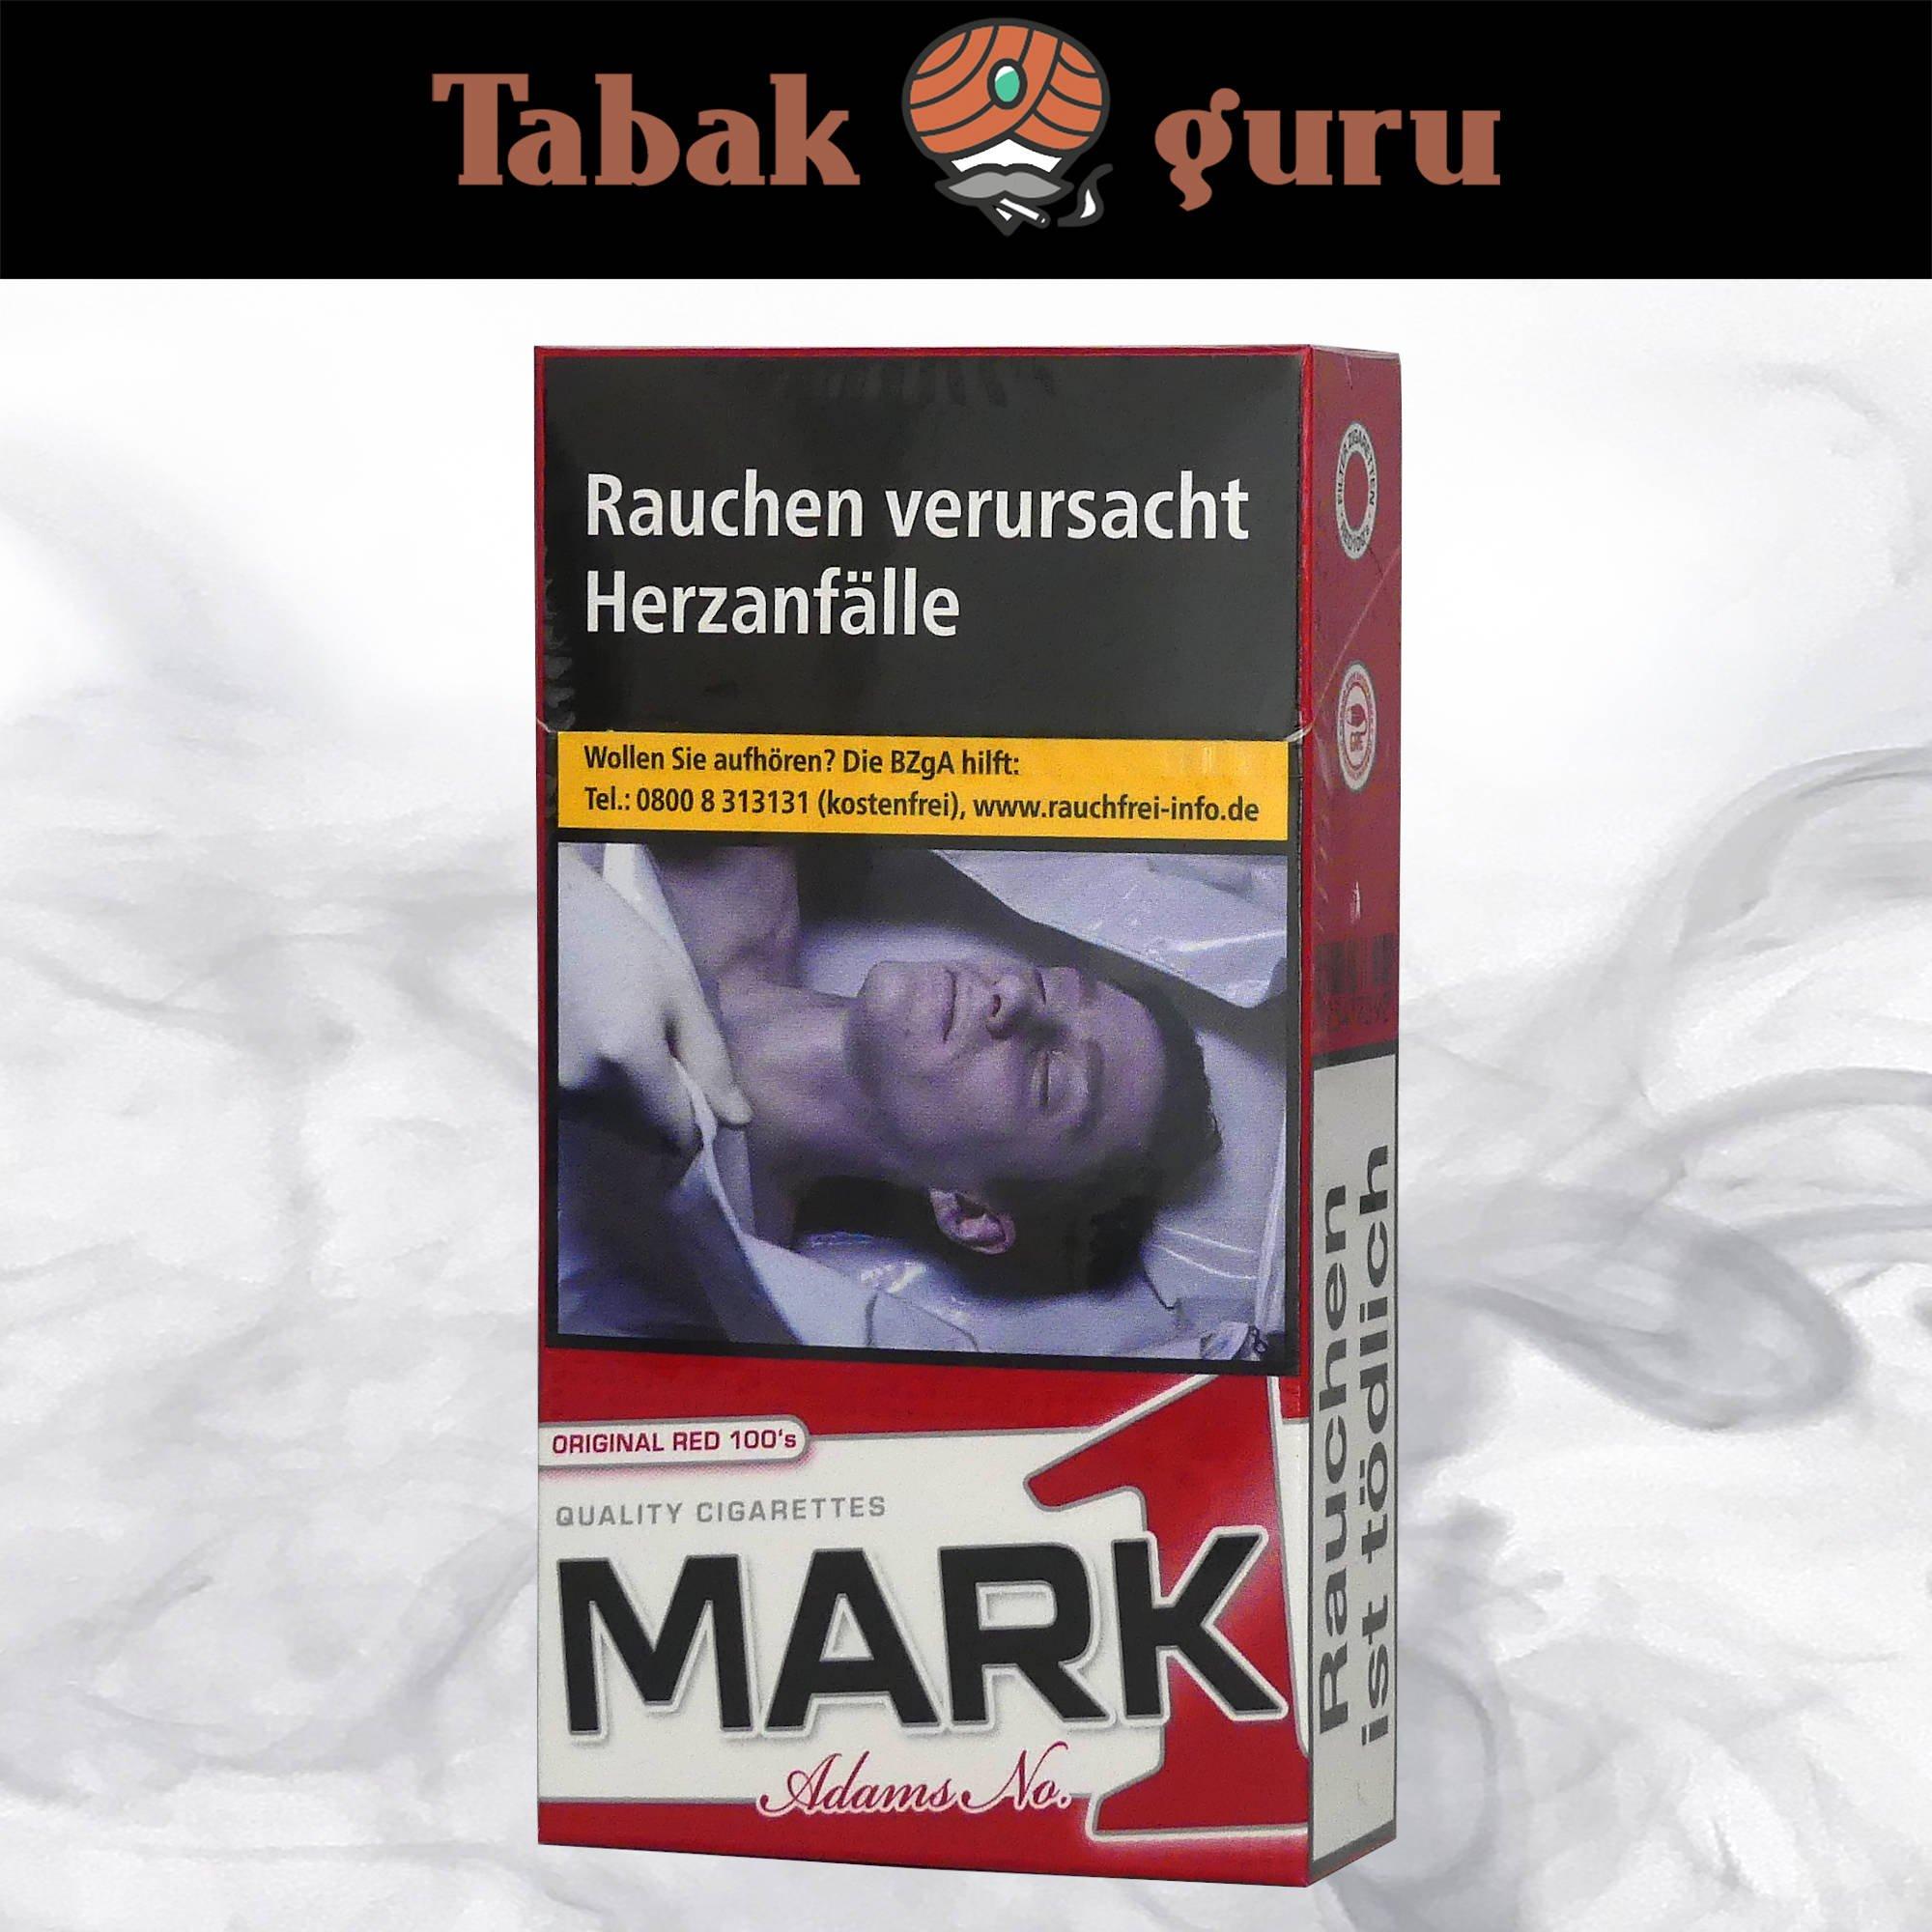 Mark Adams No. 1 / Mark1 Original Red 100's 20 Stück